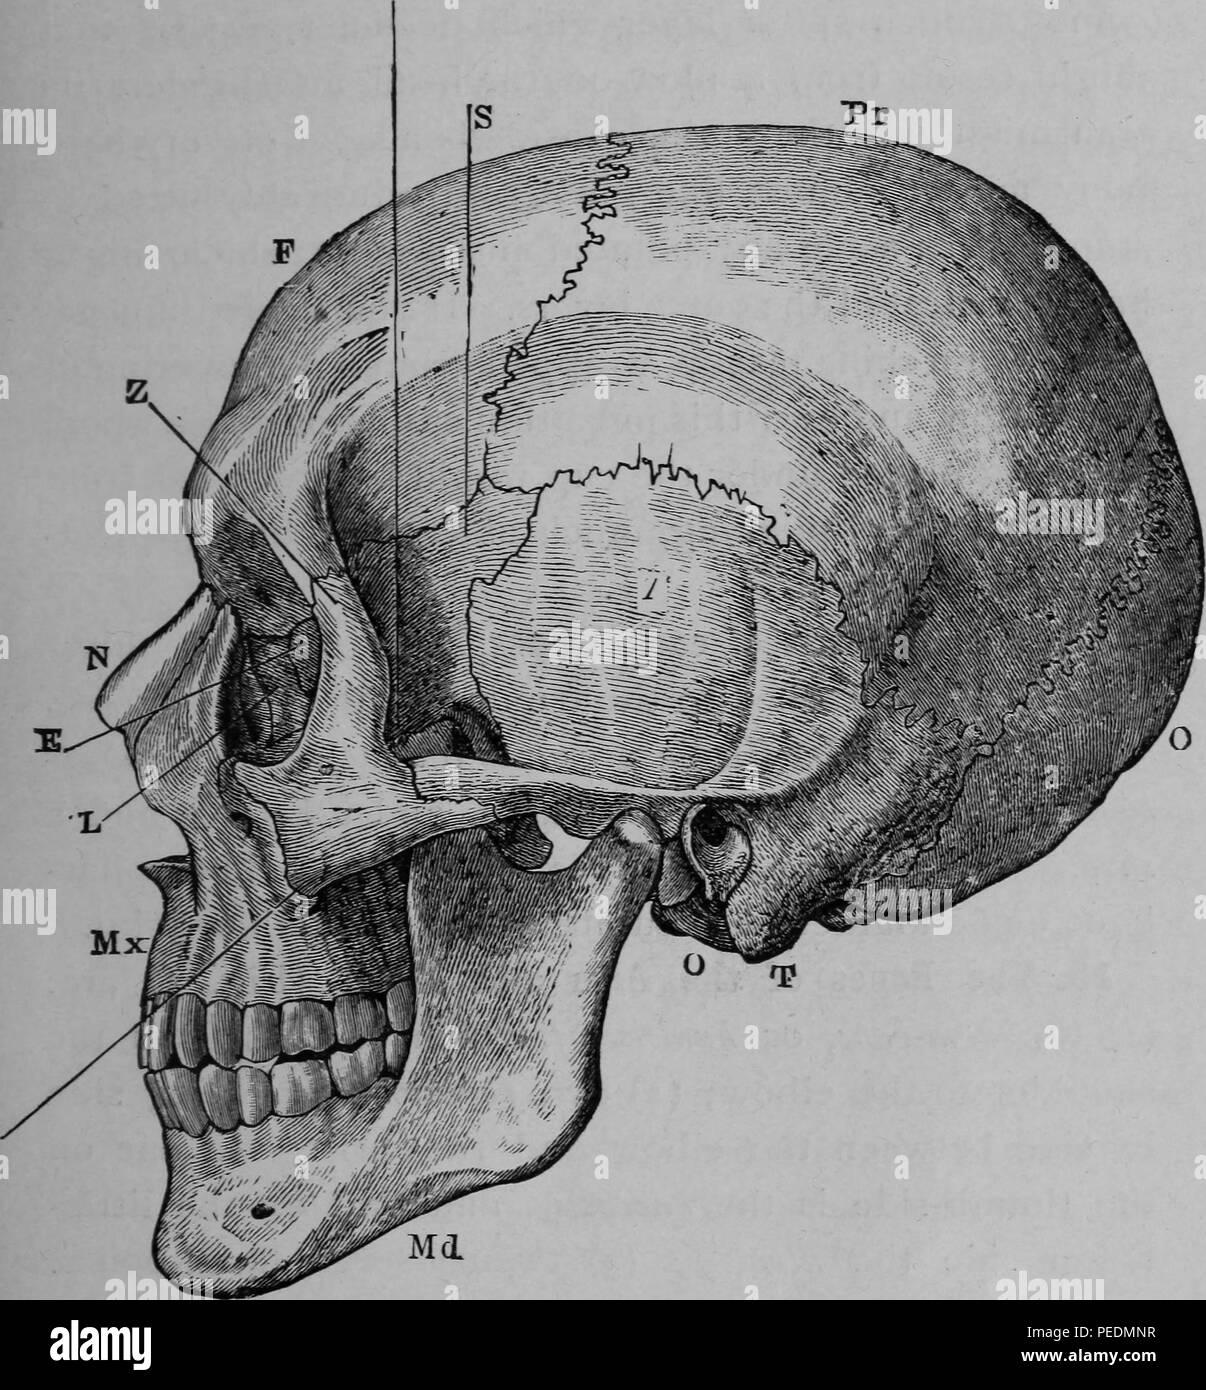 Occipital Bone Stock Photos & Occipital Bone Stock Images - Alamy